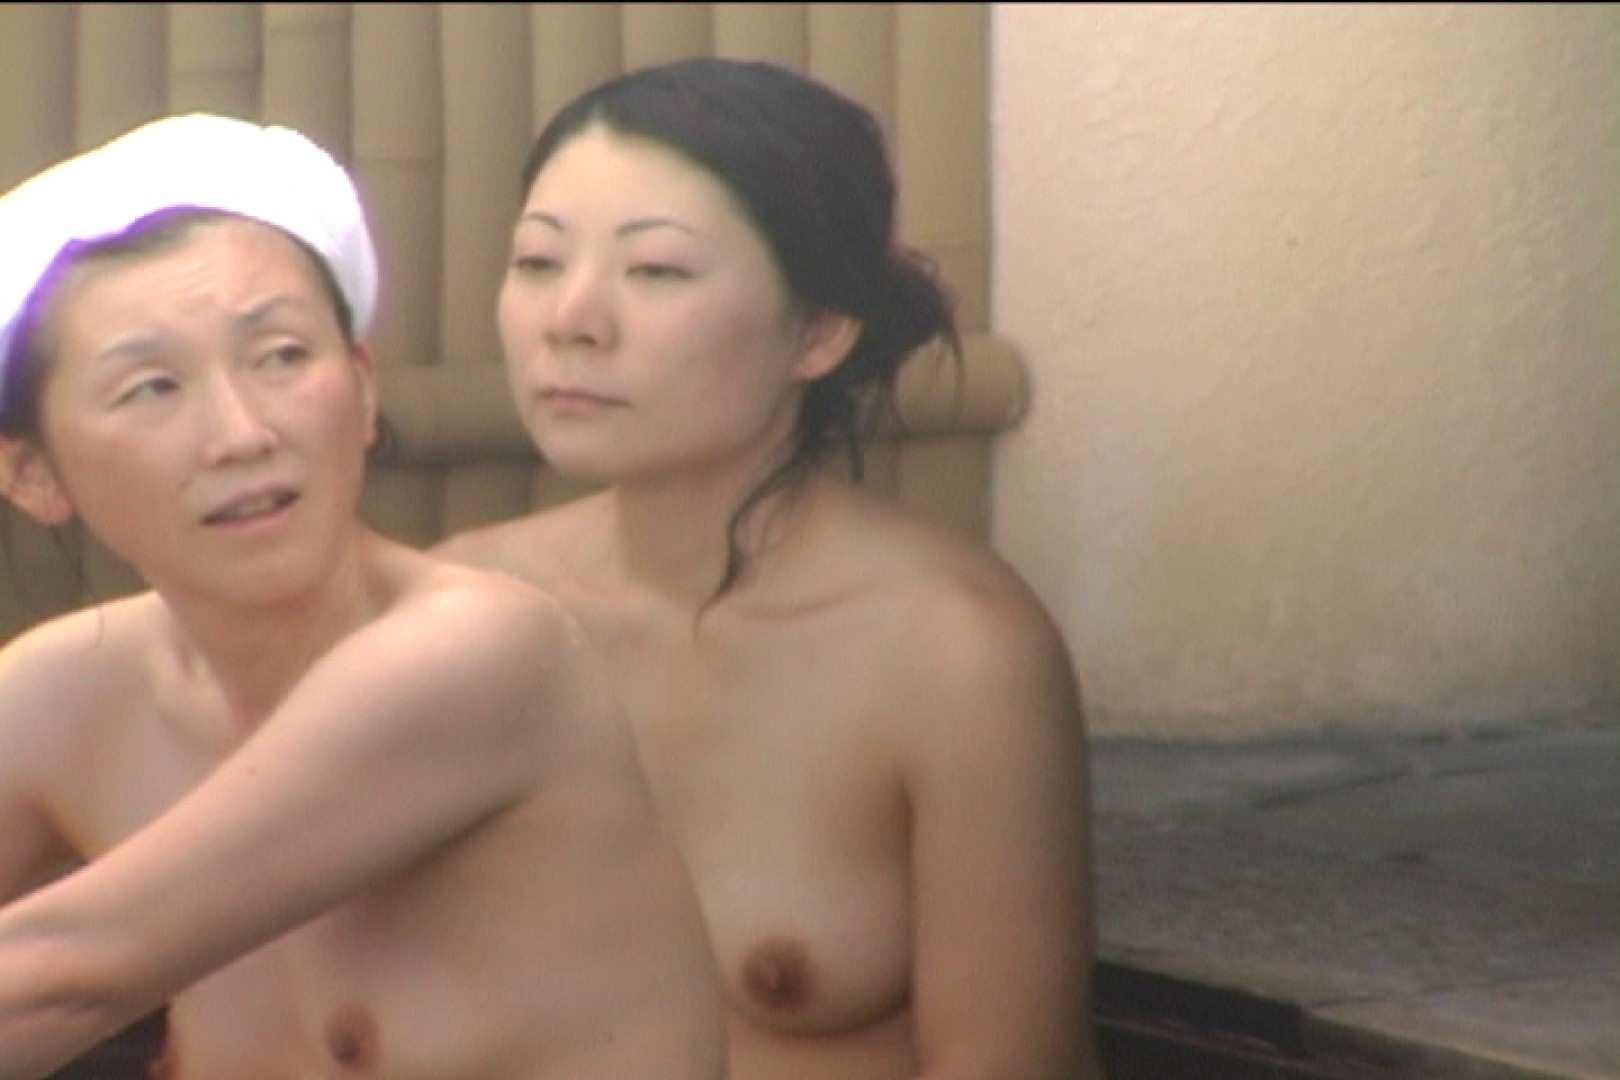 Aquaな露天風呂Vol.533 綺麗なOLたち オマンコ無修正動画無料 108枚 5